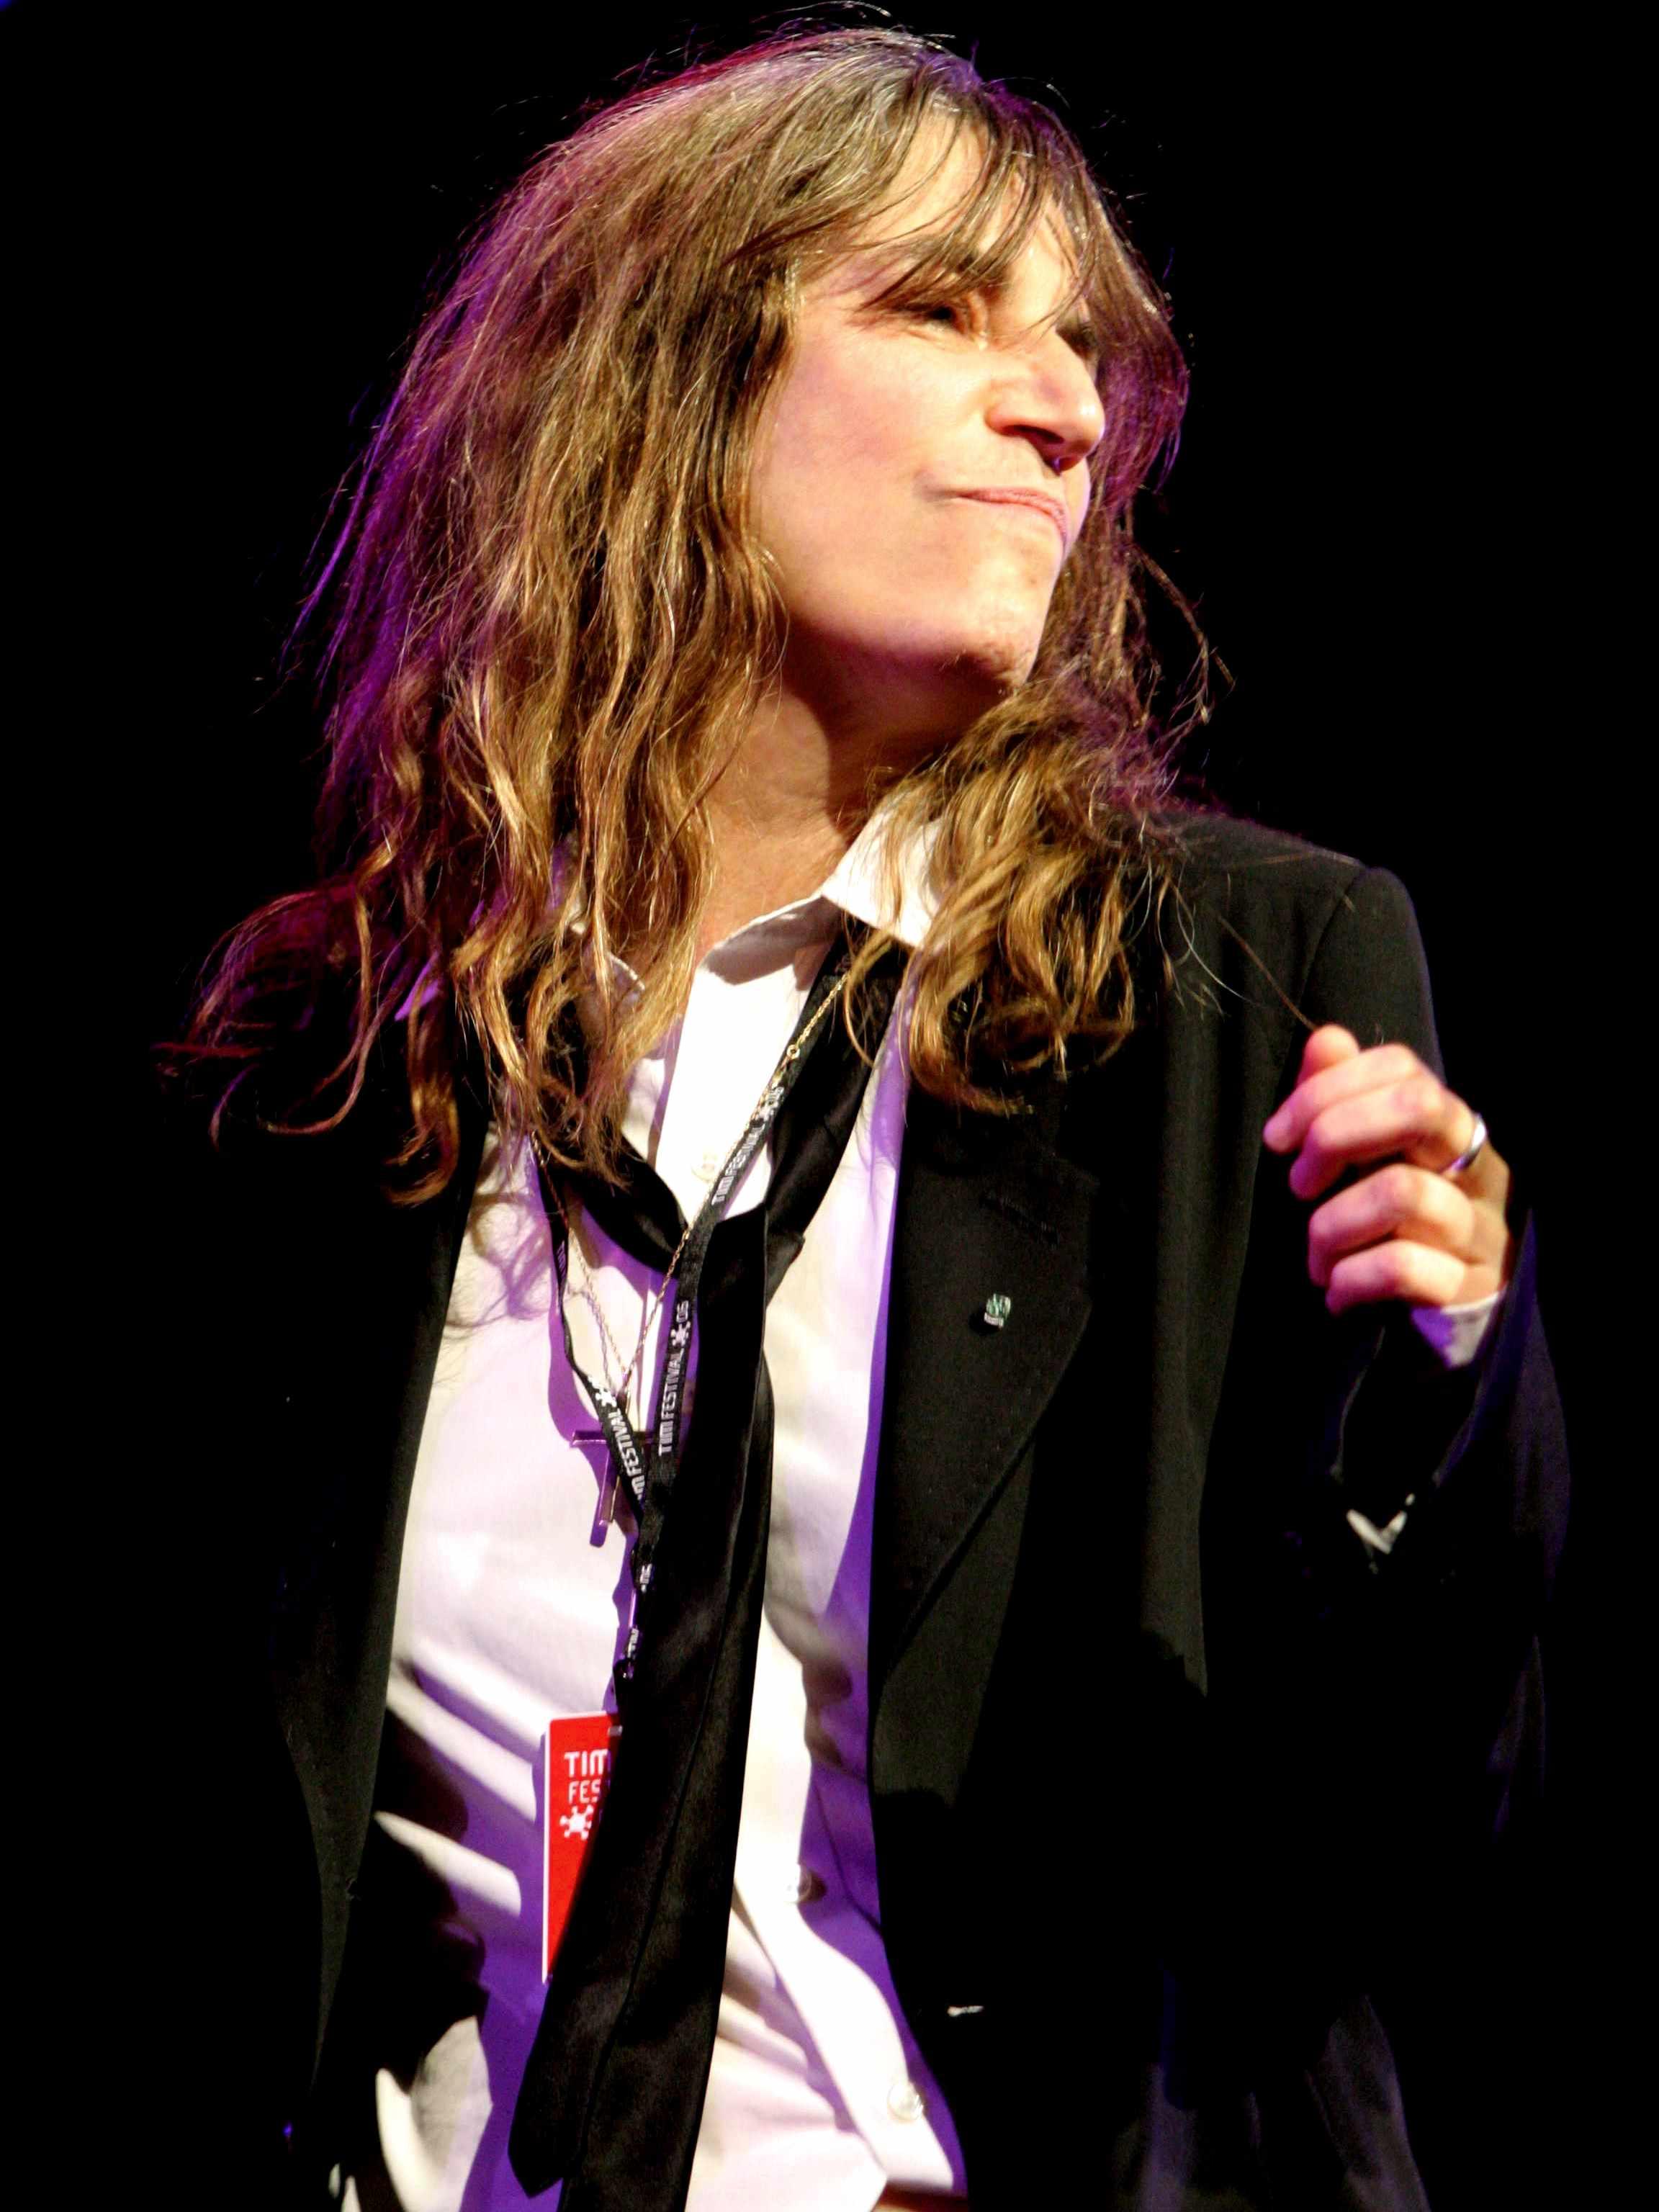 http://upload.wikimedia.org/wikipedia/commons/f/fe/Patti_Smith_performing_at_TIM_Festival,_Marina_da_Gloria,_Rio_De_Janeiro_(4).jpg